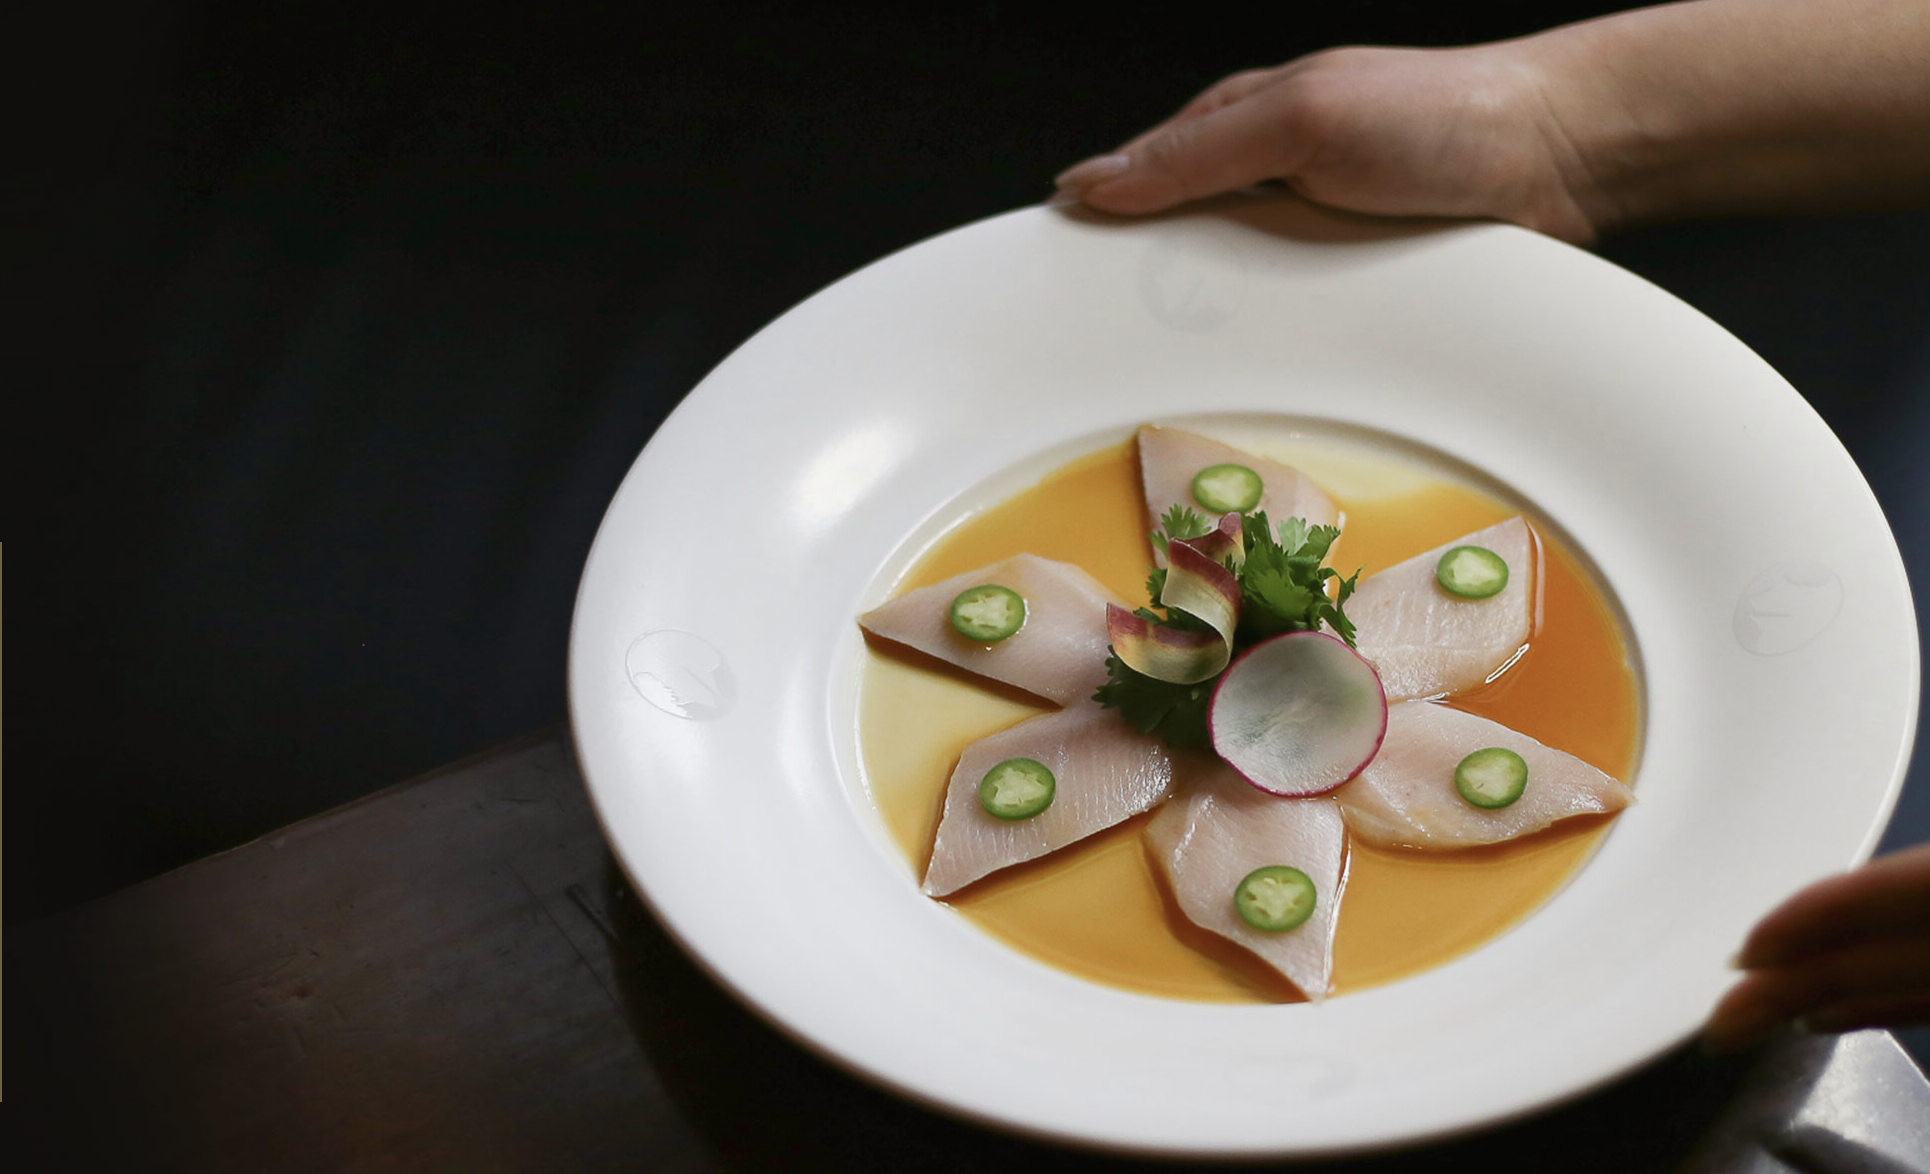 Yellowtail sashimi with jalapeño at Nobu